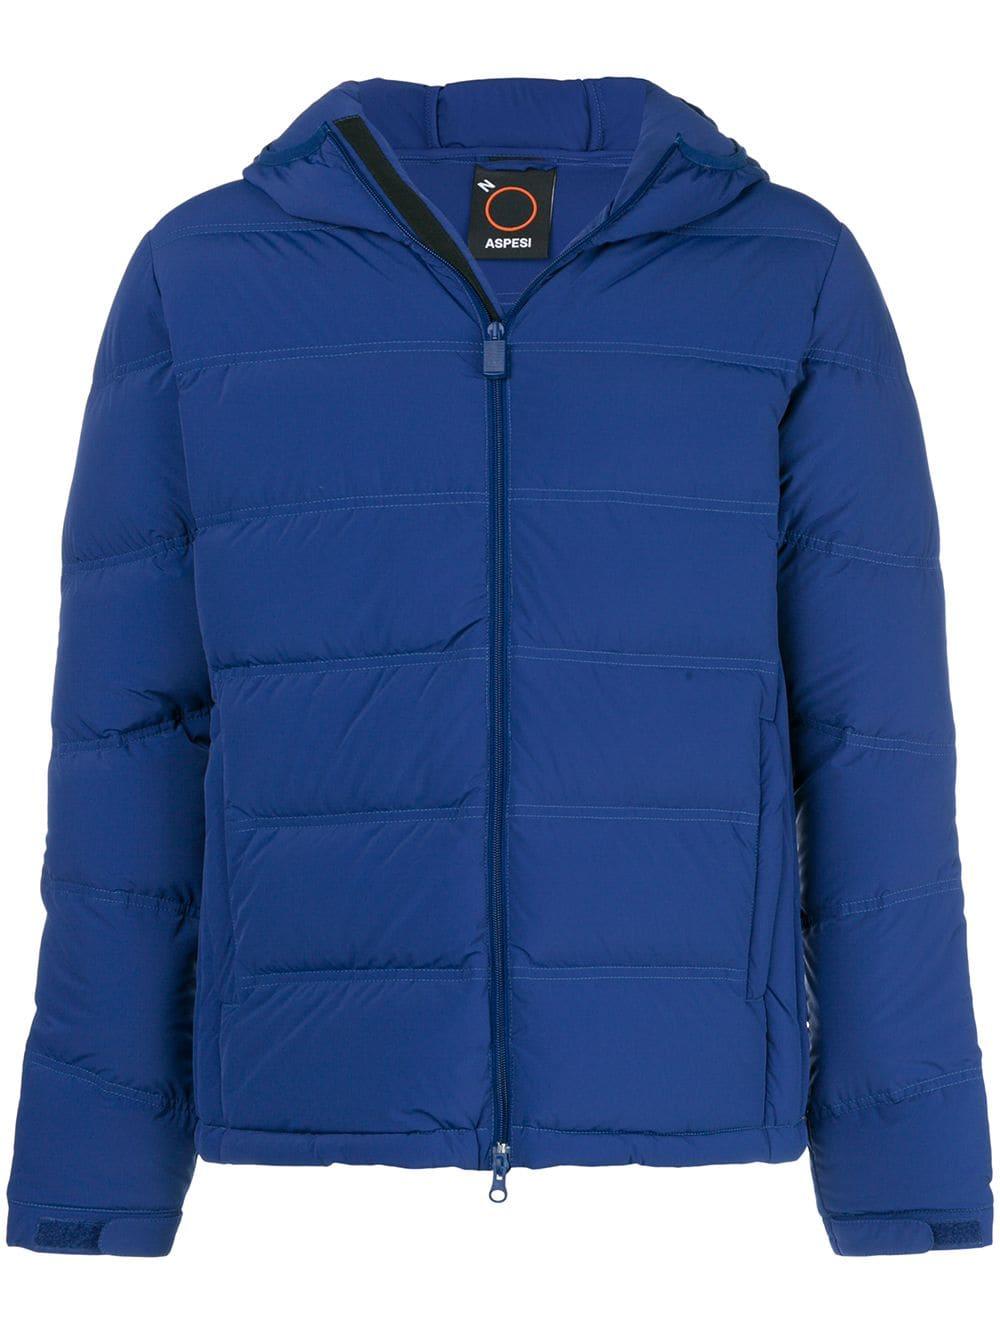 detailed look 872c7 068bc Royal Blue Down Jacket